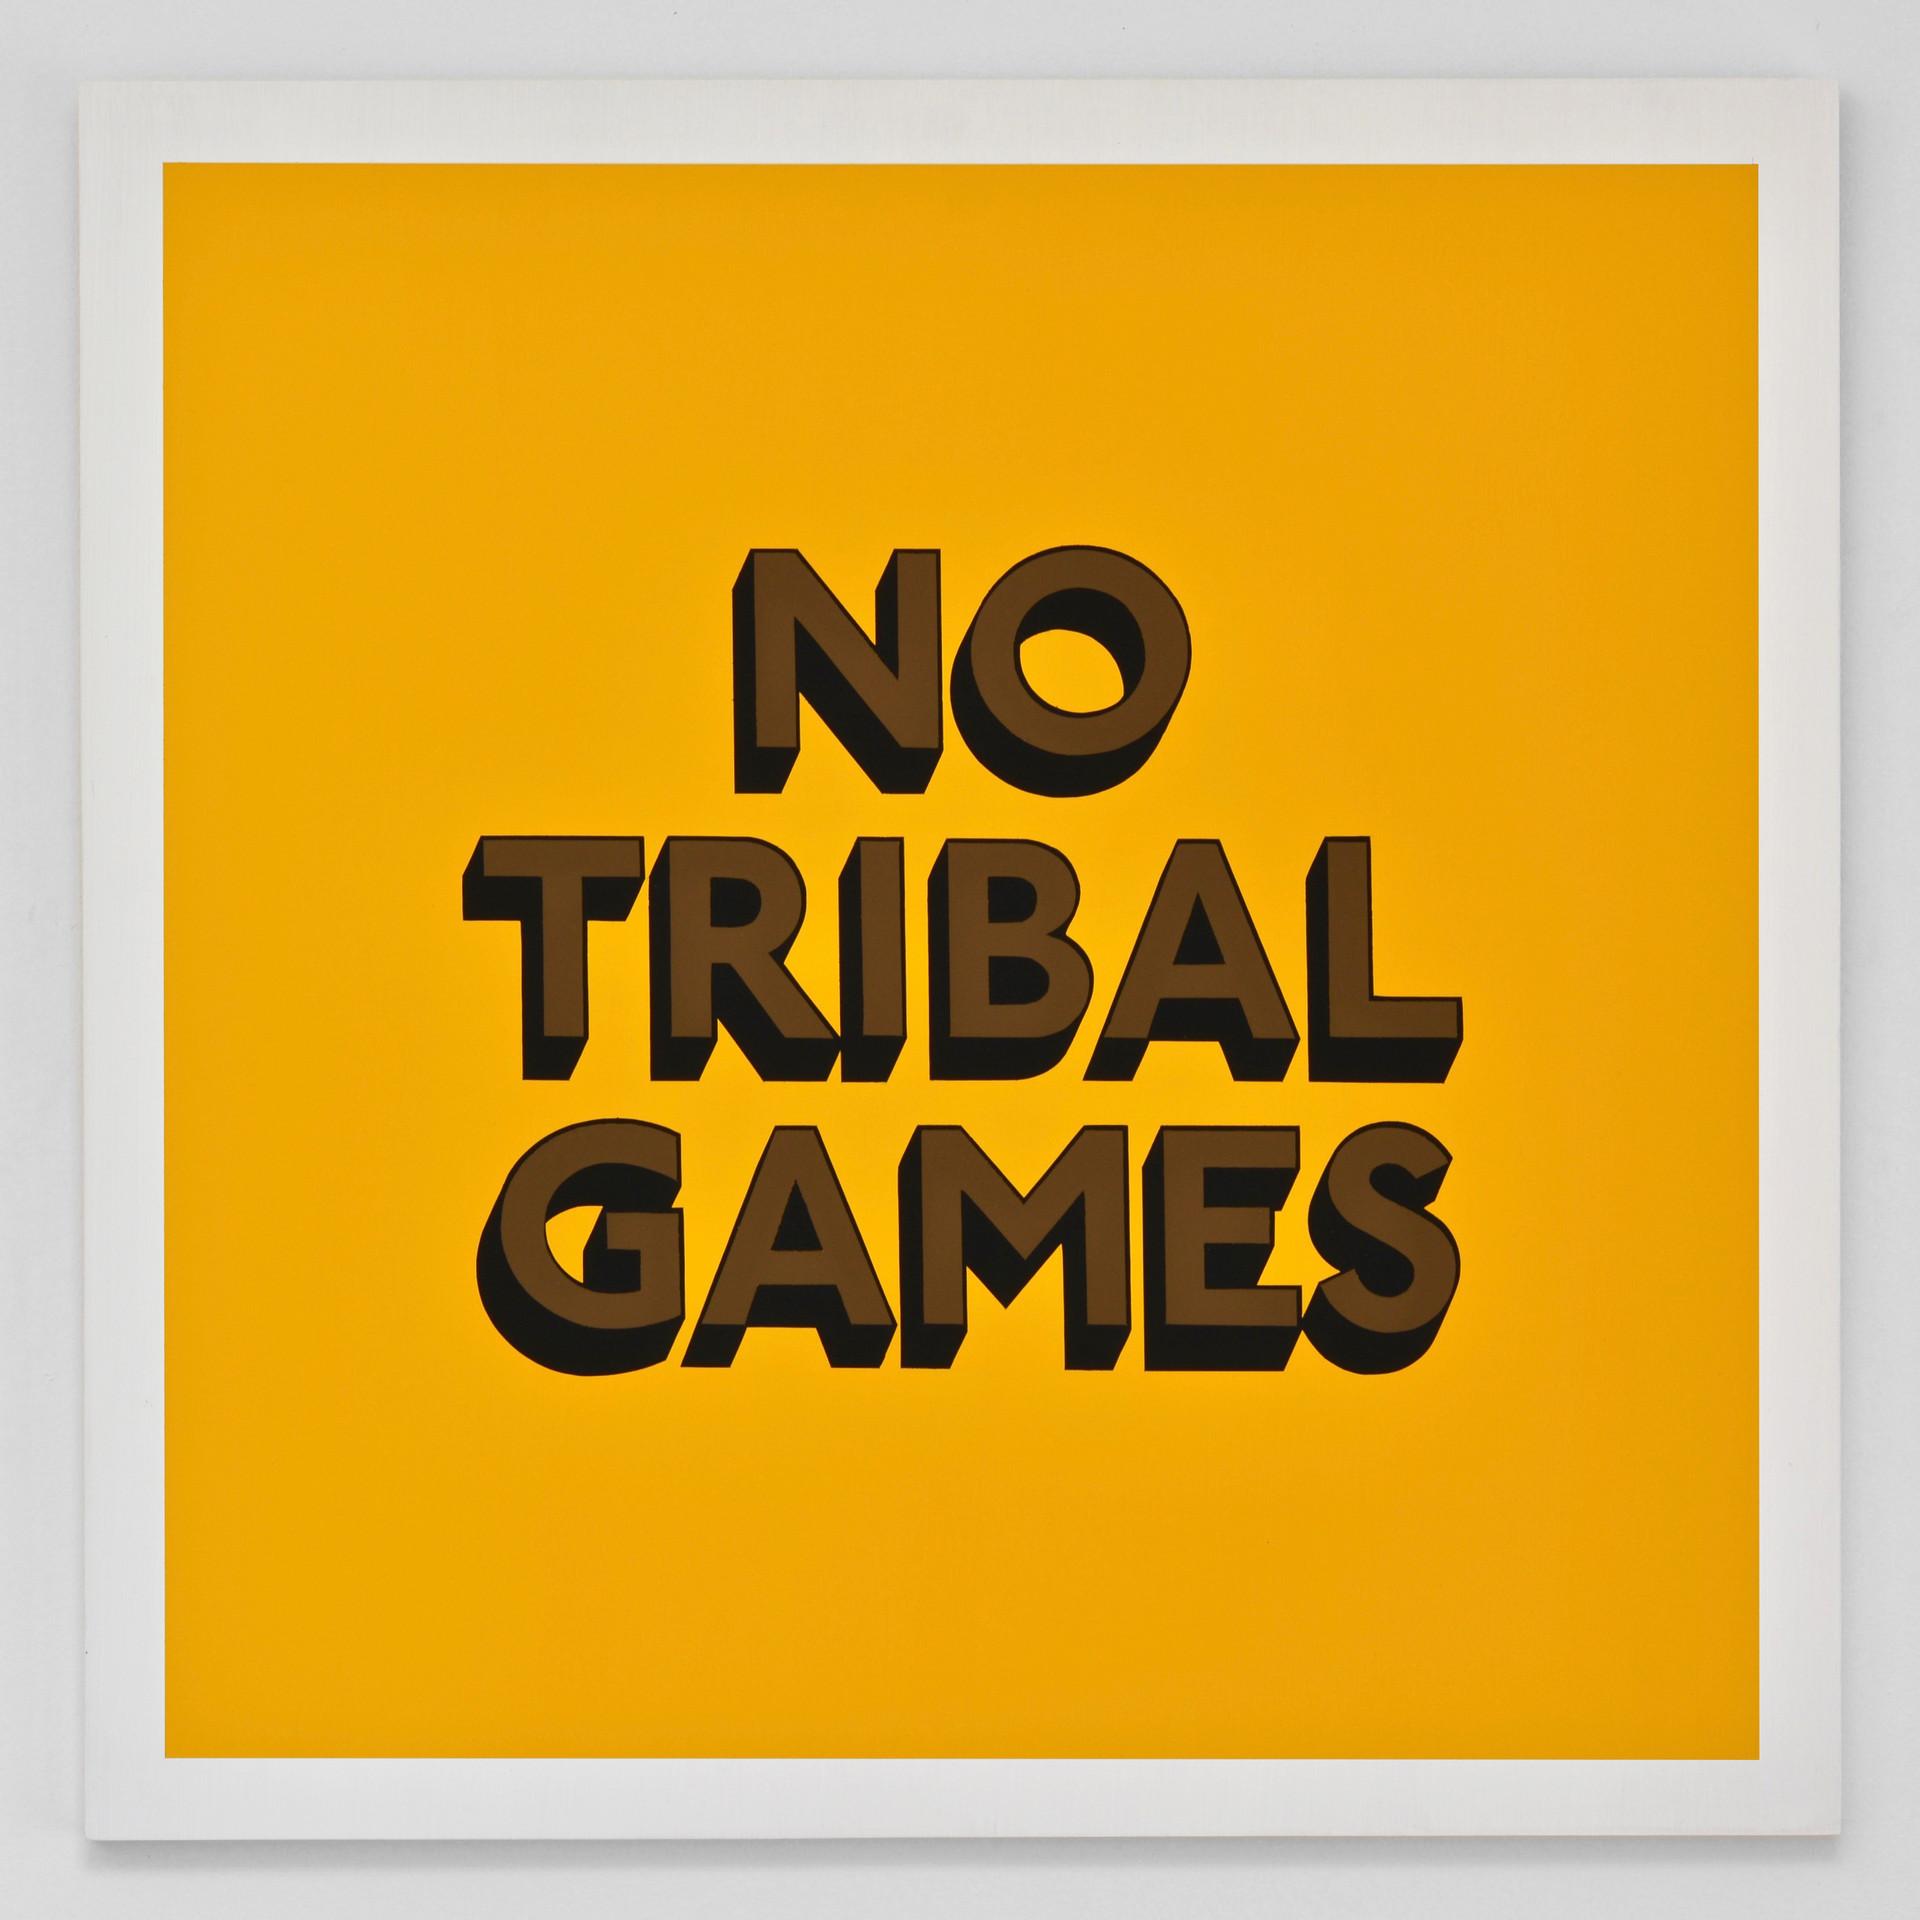 NO_TRIBAL_GAMES.jpg